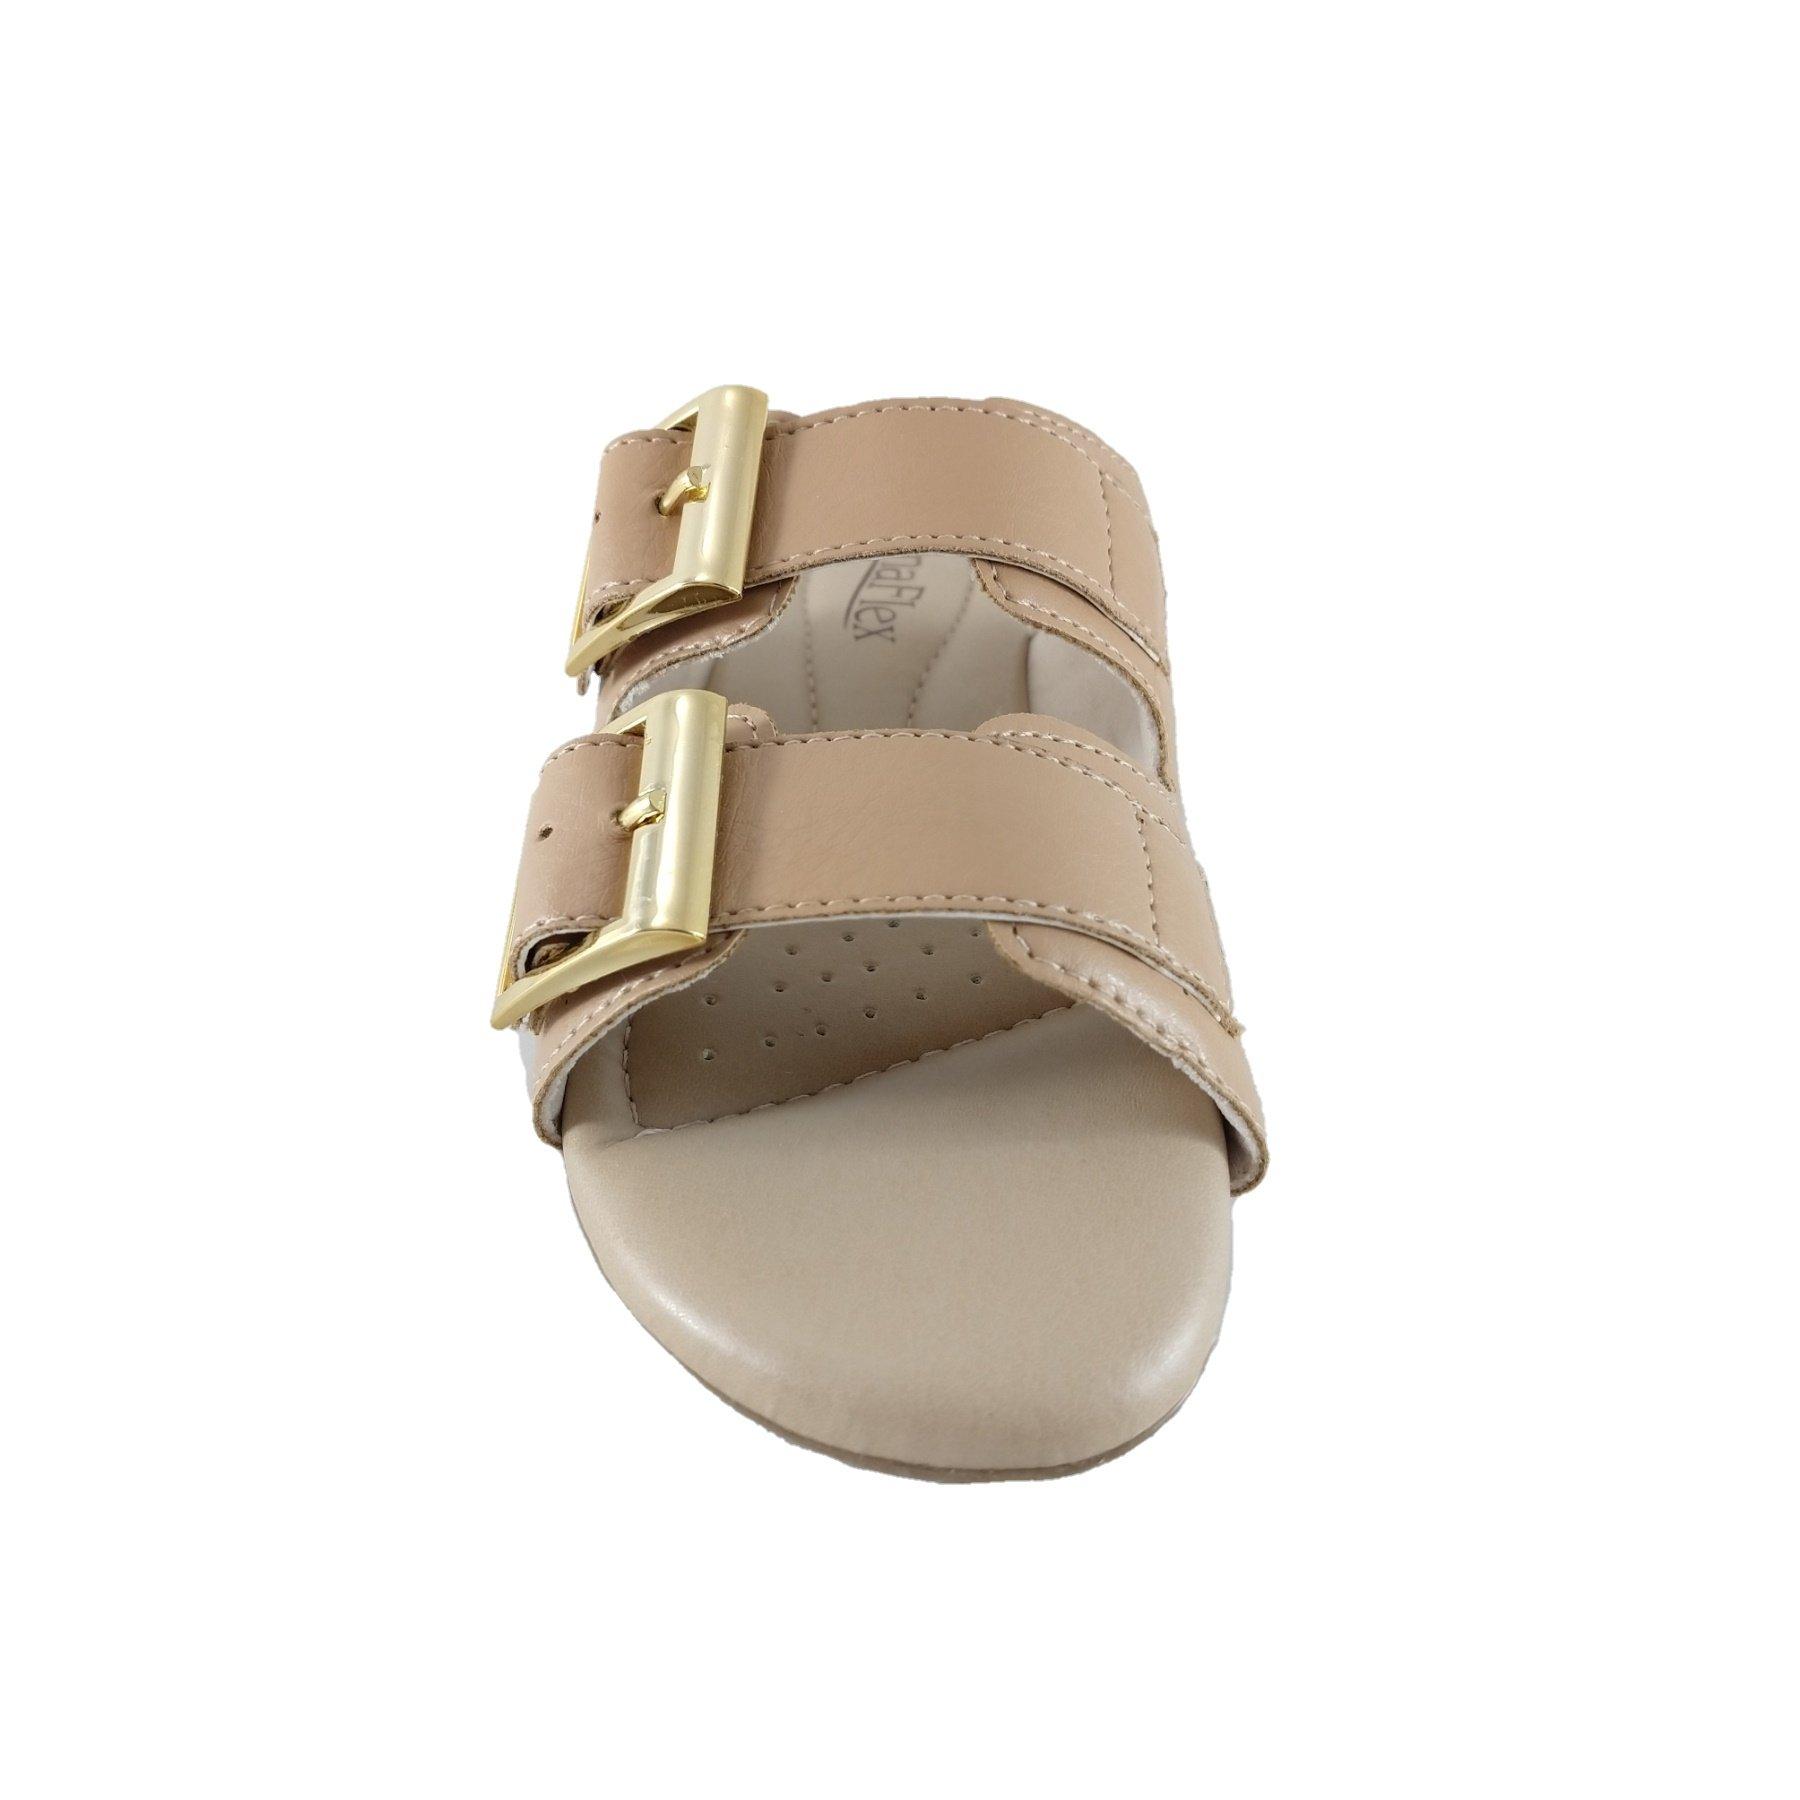 Sandália Confort SapatoWeb Flex Nude  - SAPATOWEB.COM